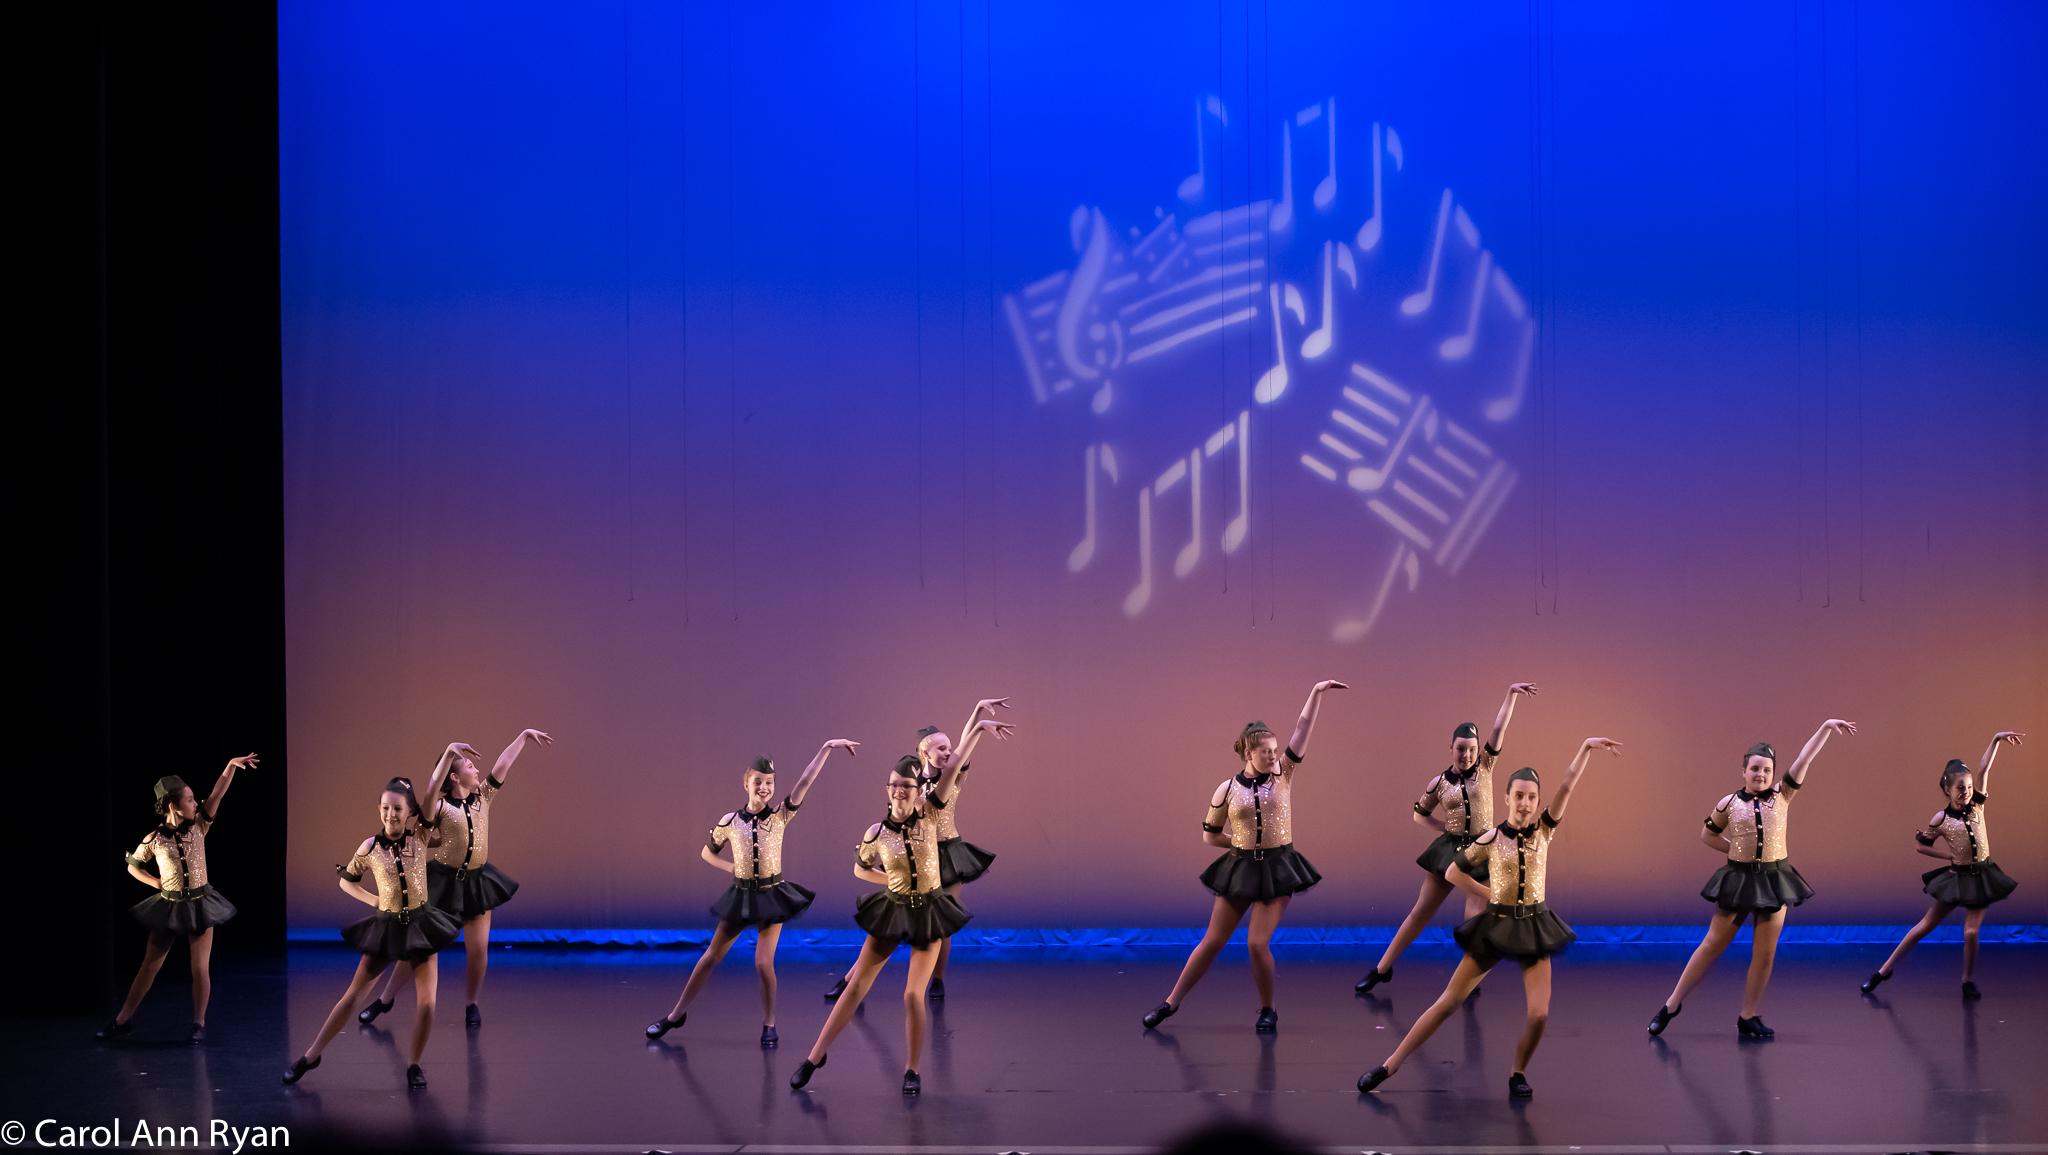 2019_06_06-Dance Recital37781-1.jpg